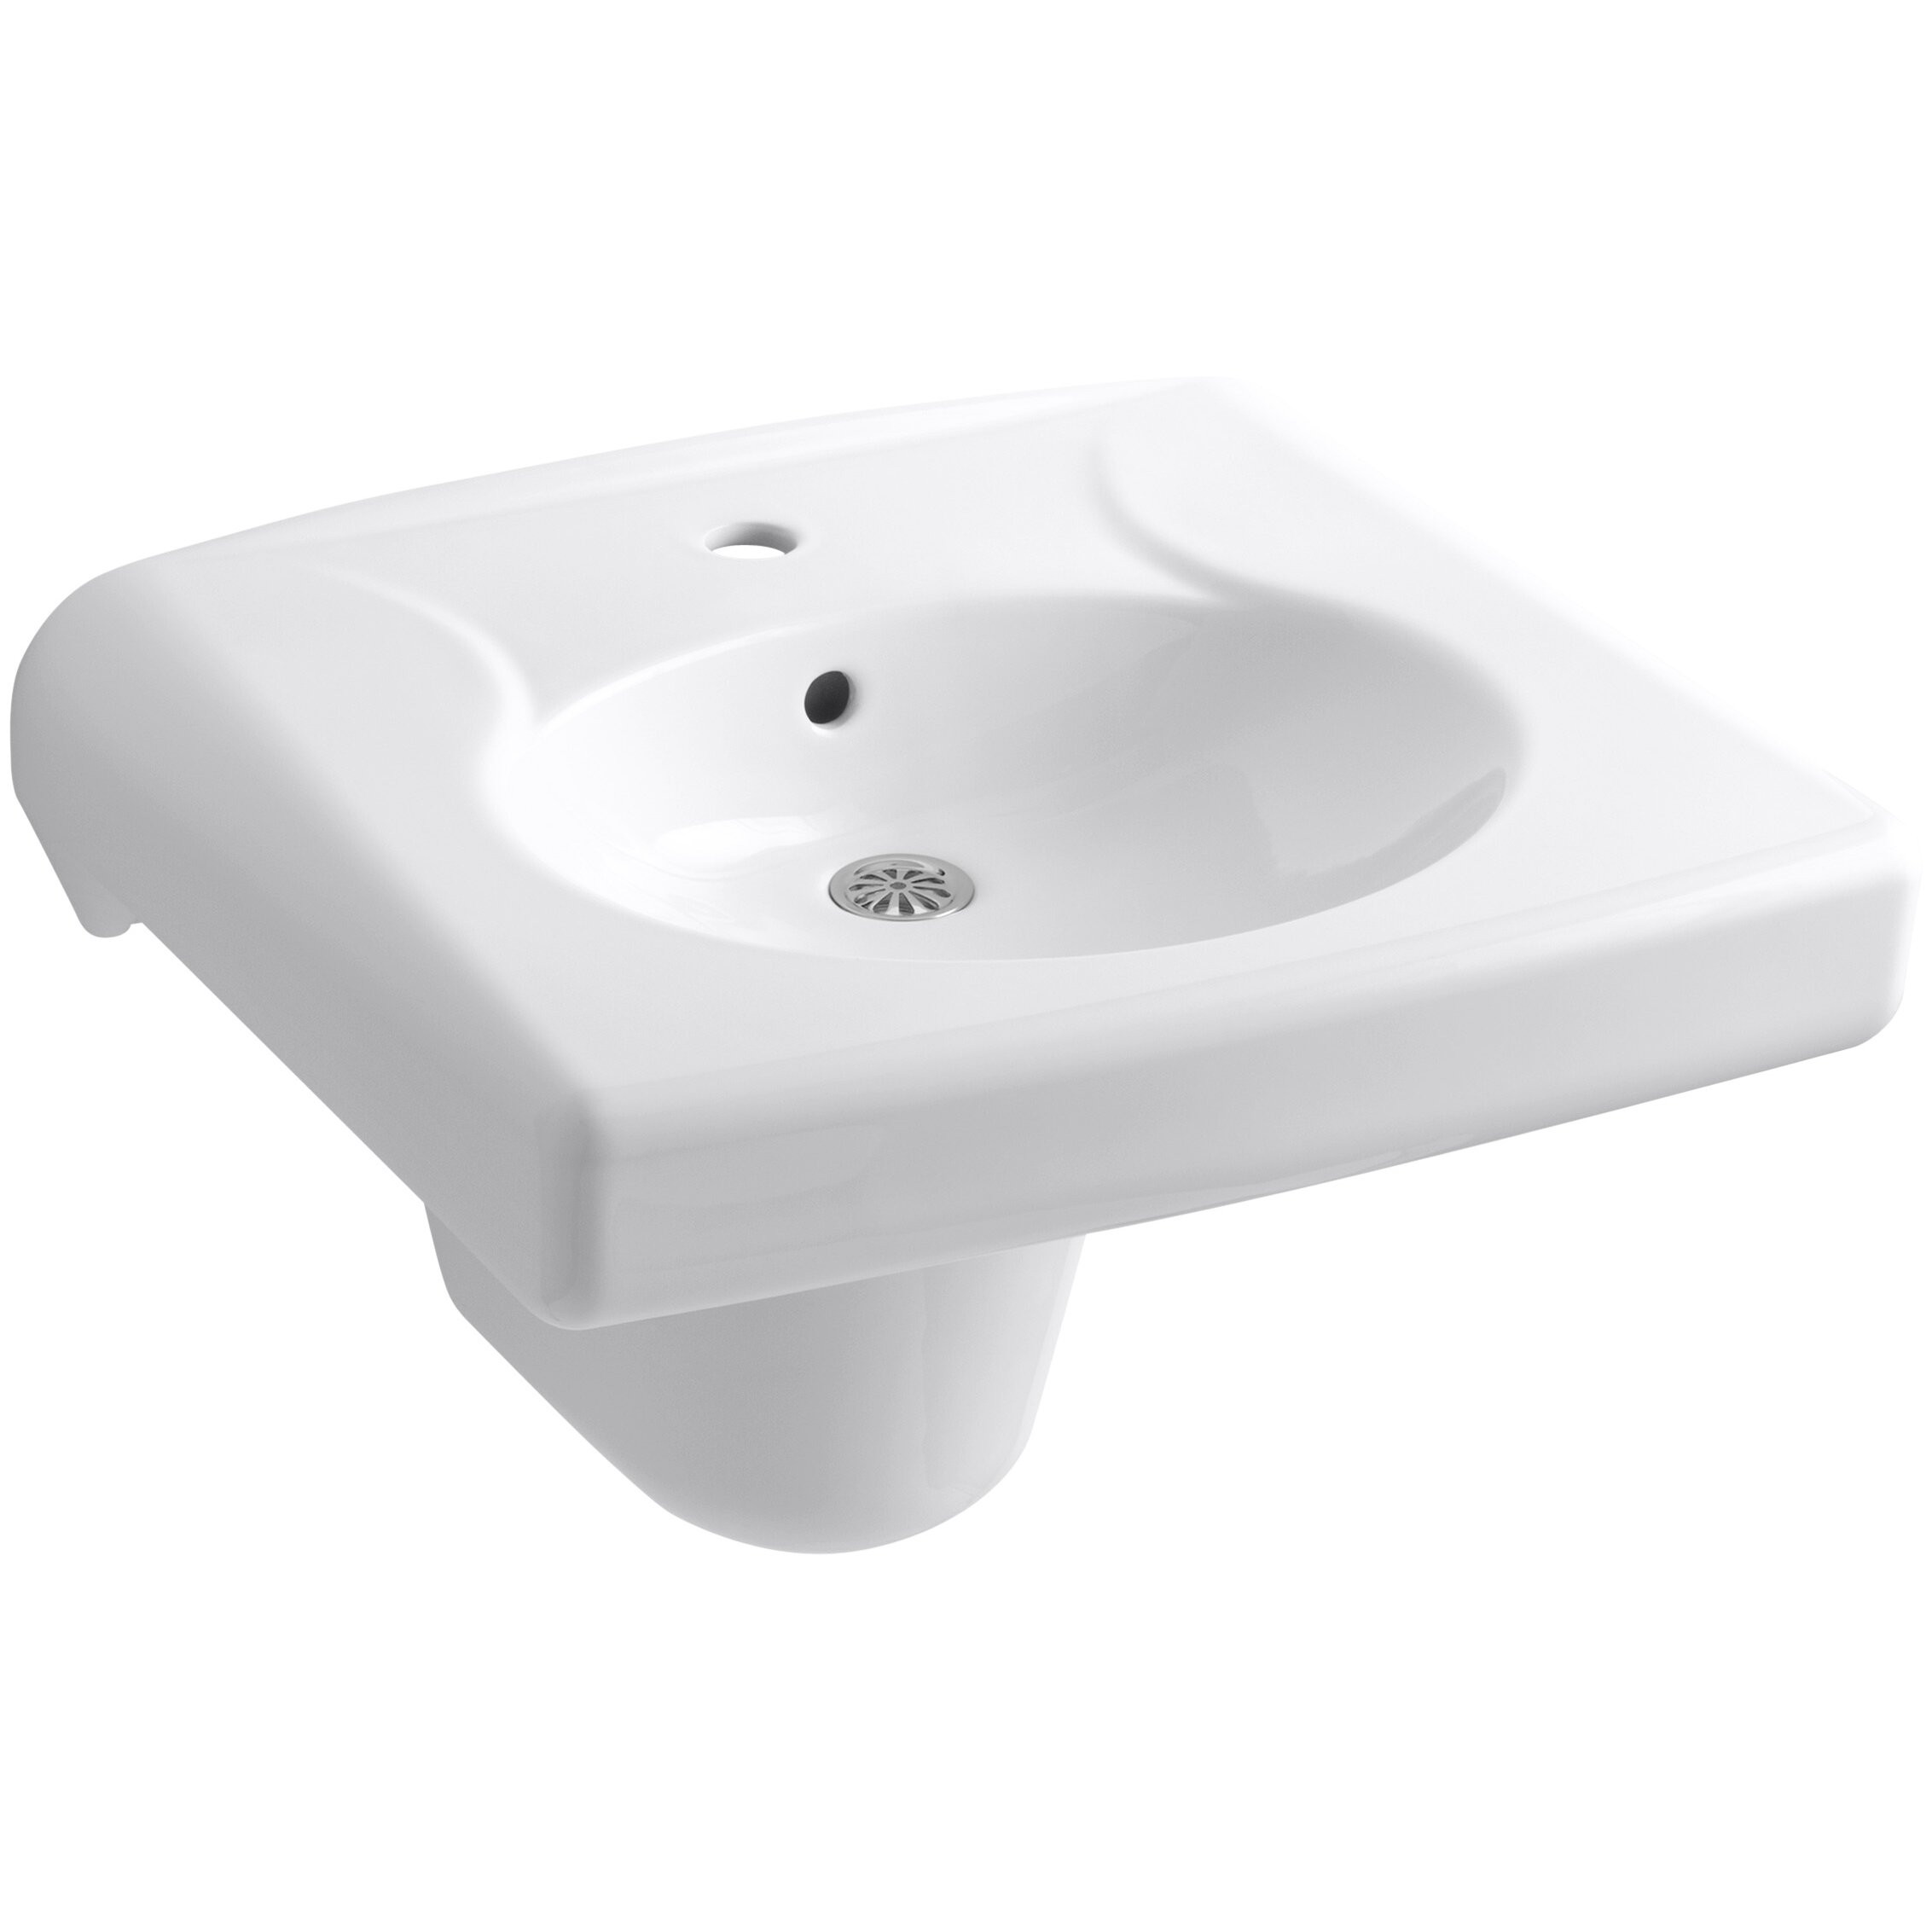 Kohler Brenham Wall Mounted Or Concealed Carrier Arm Mounted Commercial Bathroom Sink Wayfair